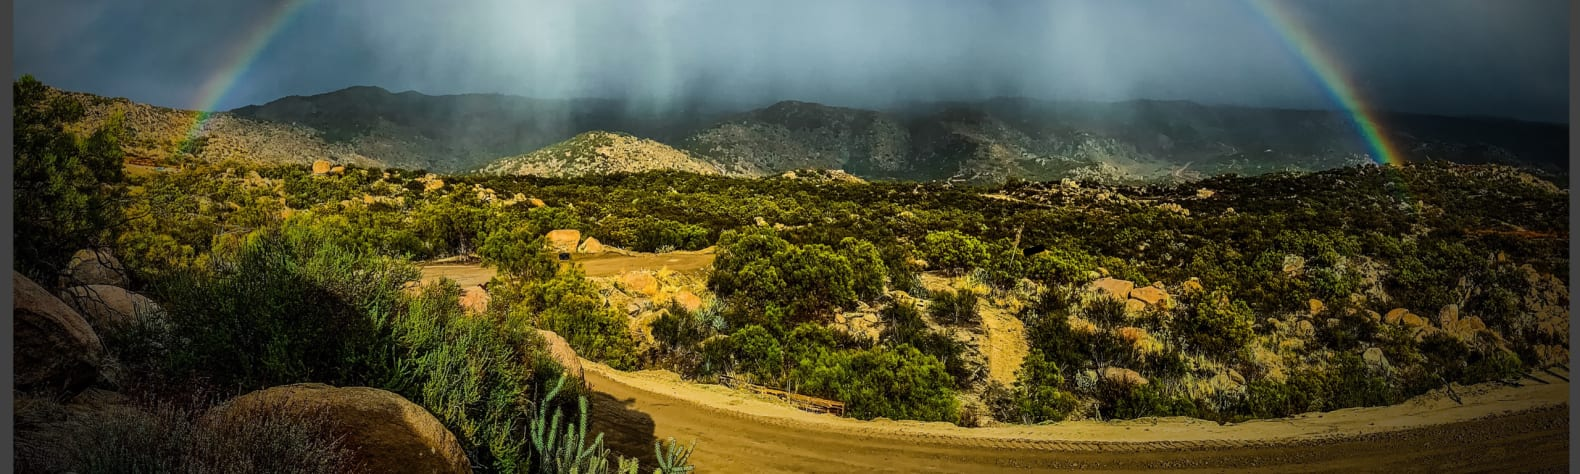 The Preserve at Aguanga Ranchos